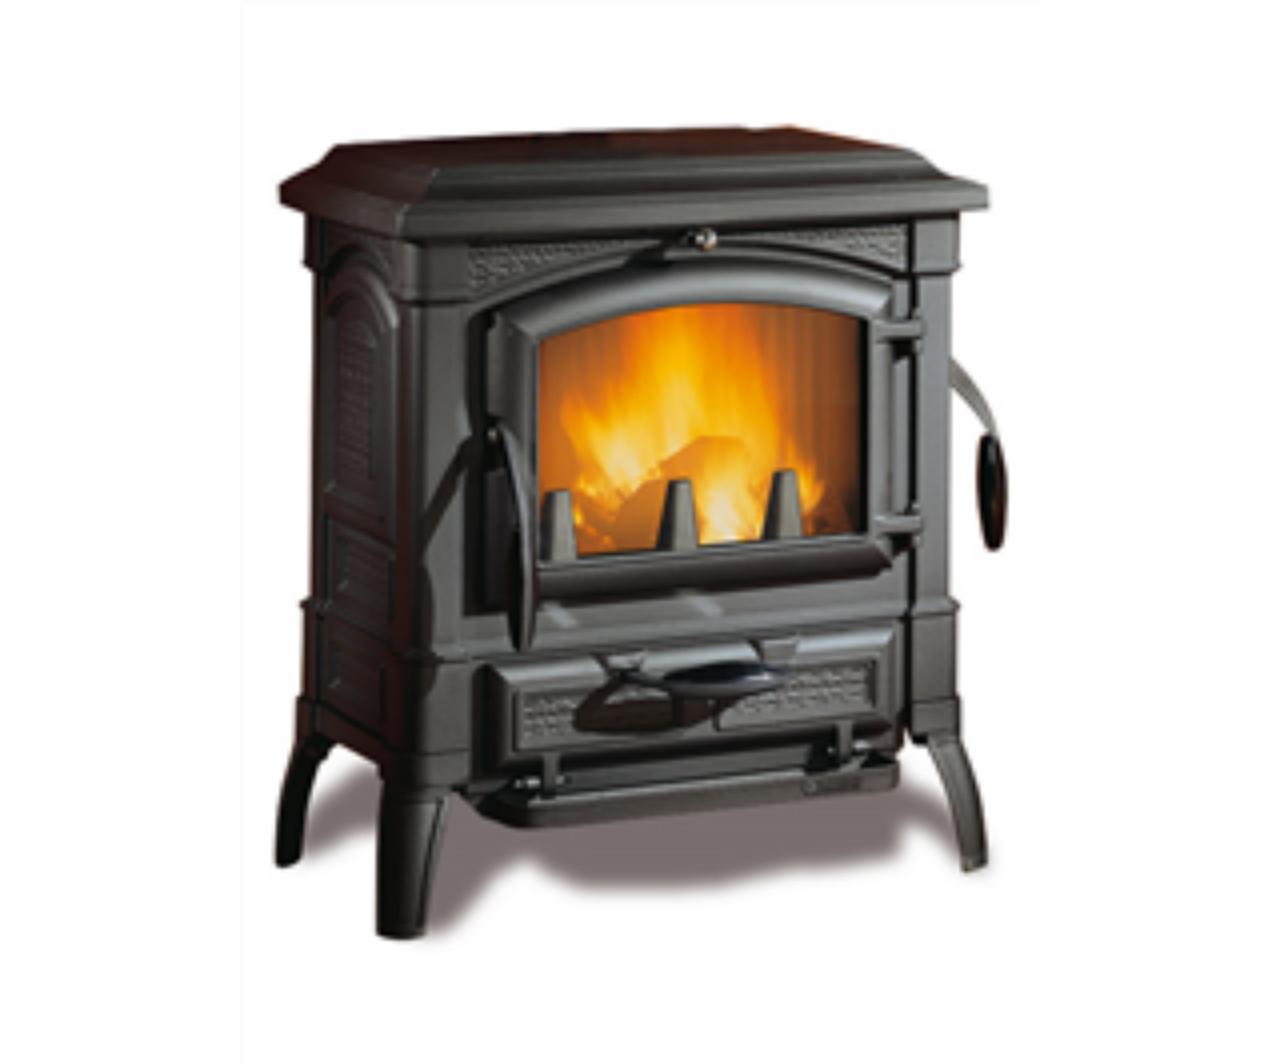 nordica isetta po le bois de stove sellers. Black Bedroom Furniture Sets. Home Design Ideas